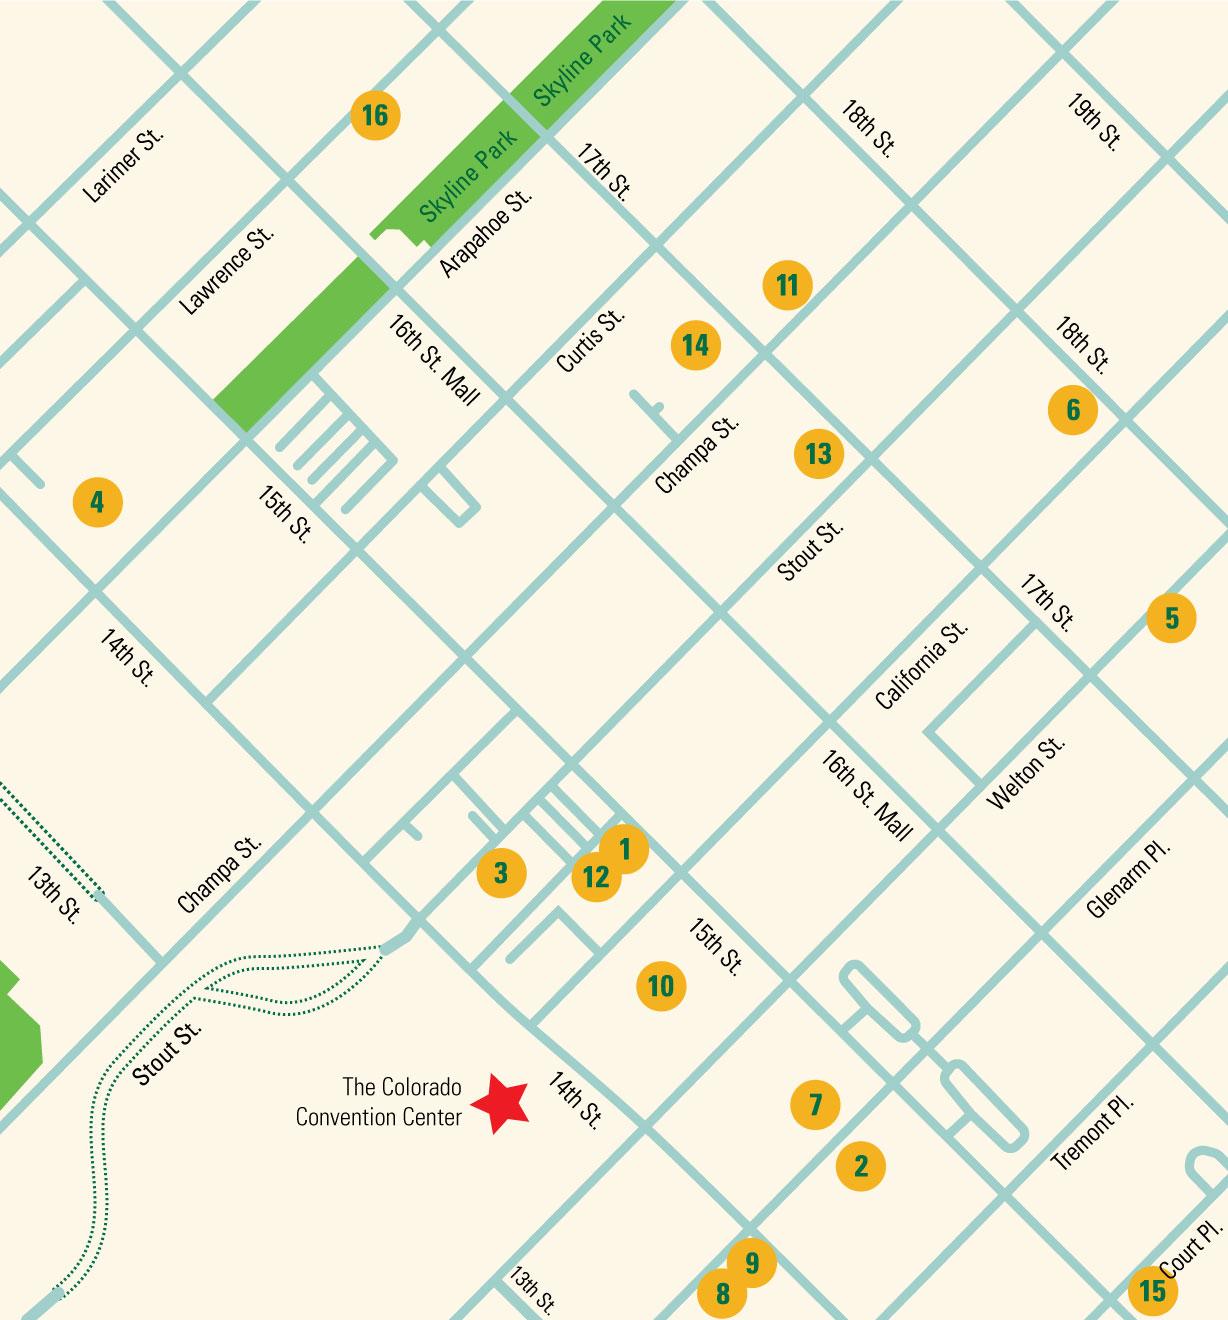 hotel-map-2020.jpg